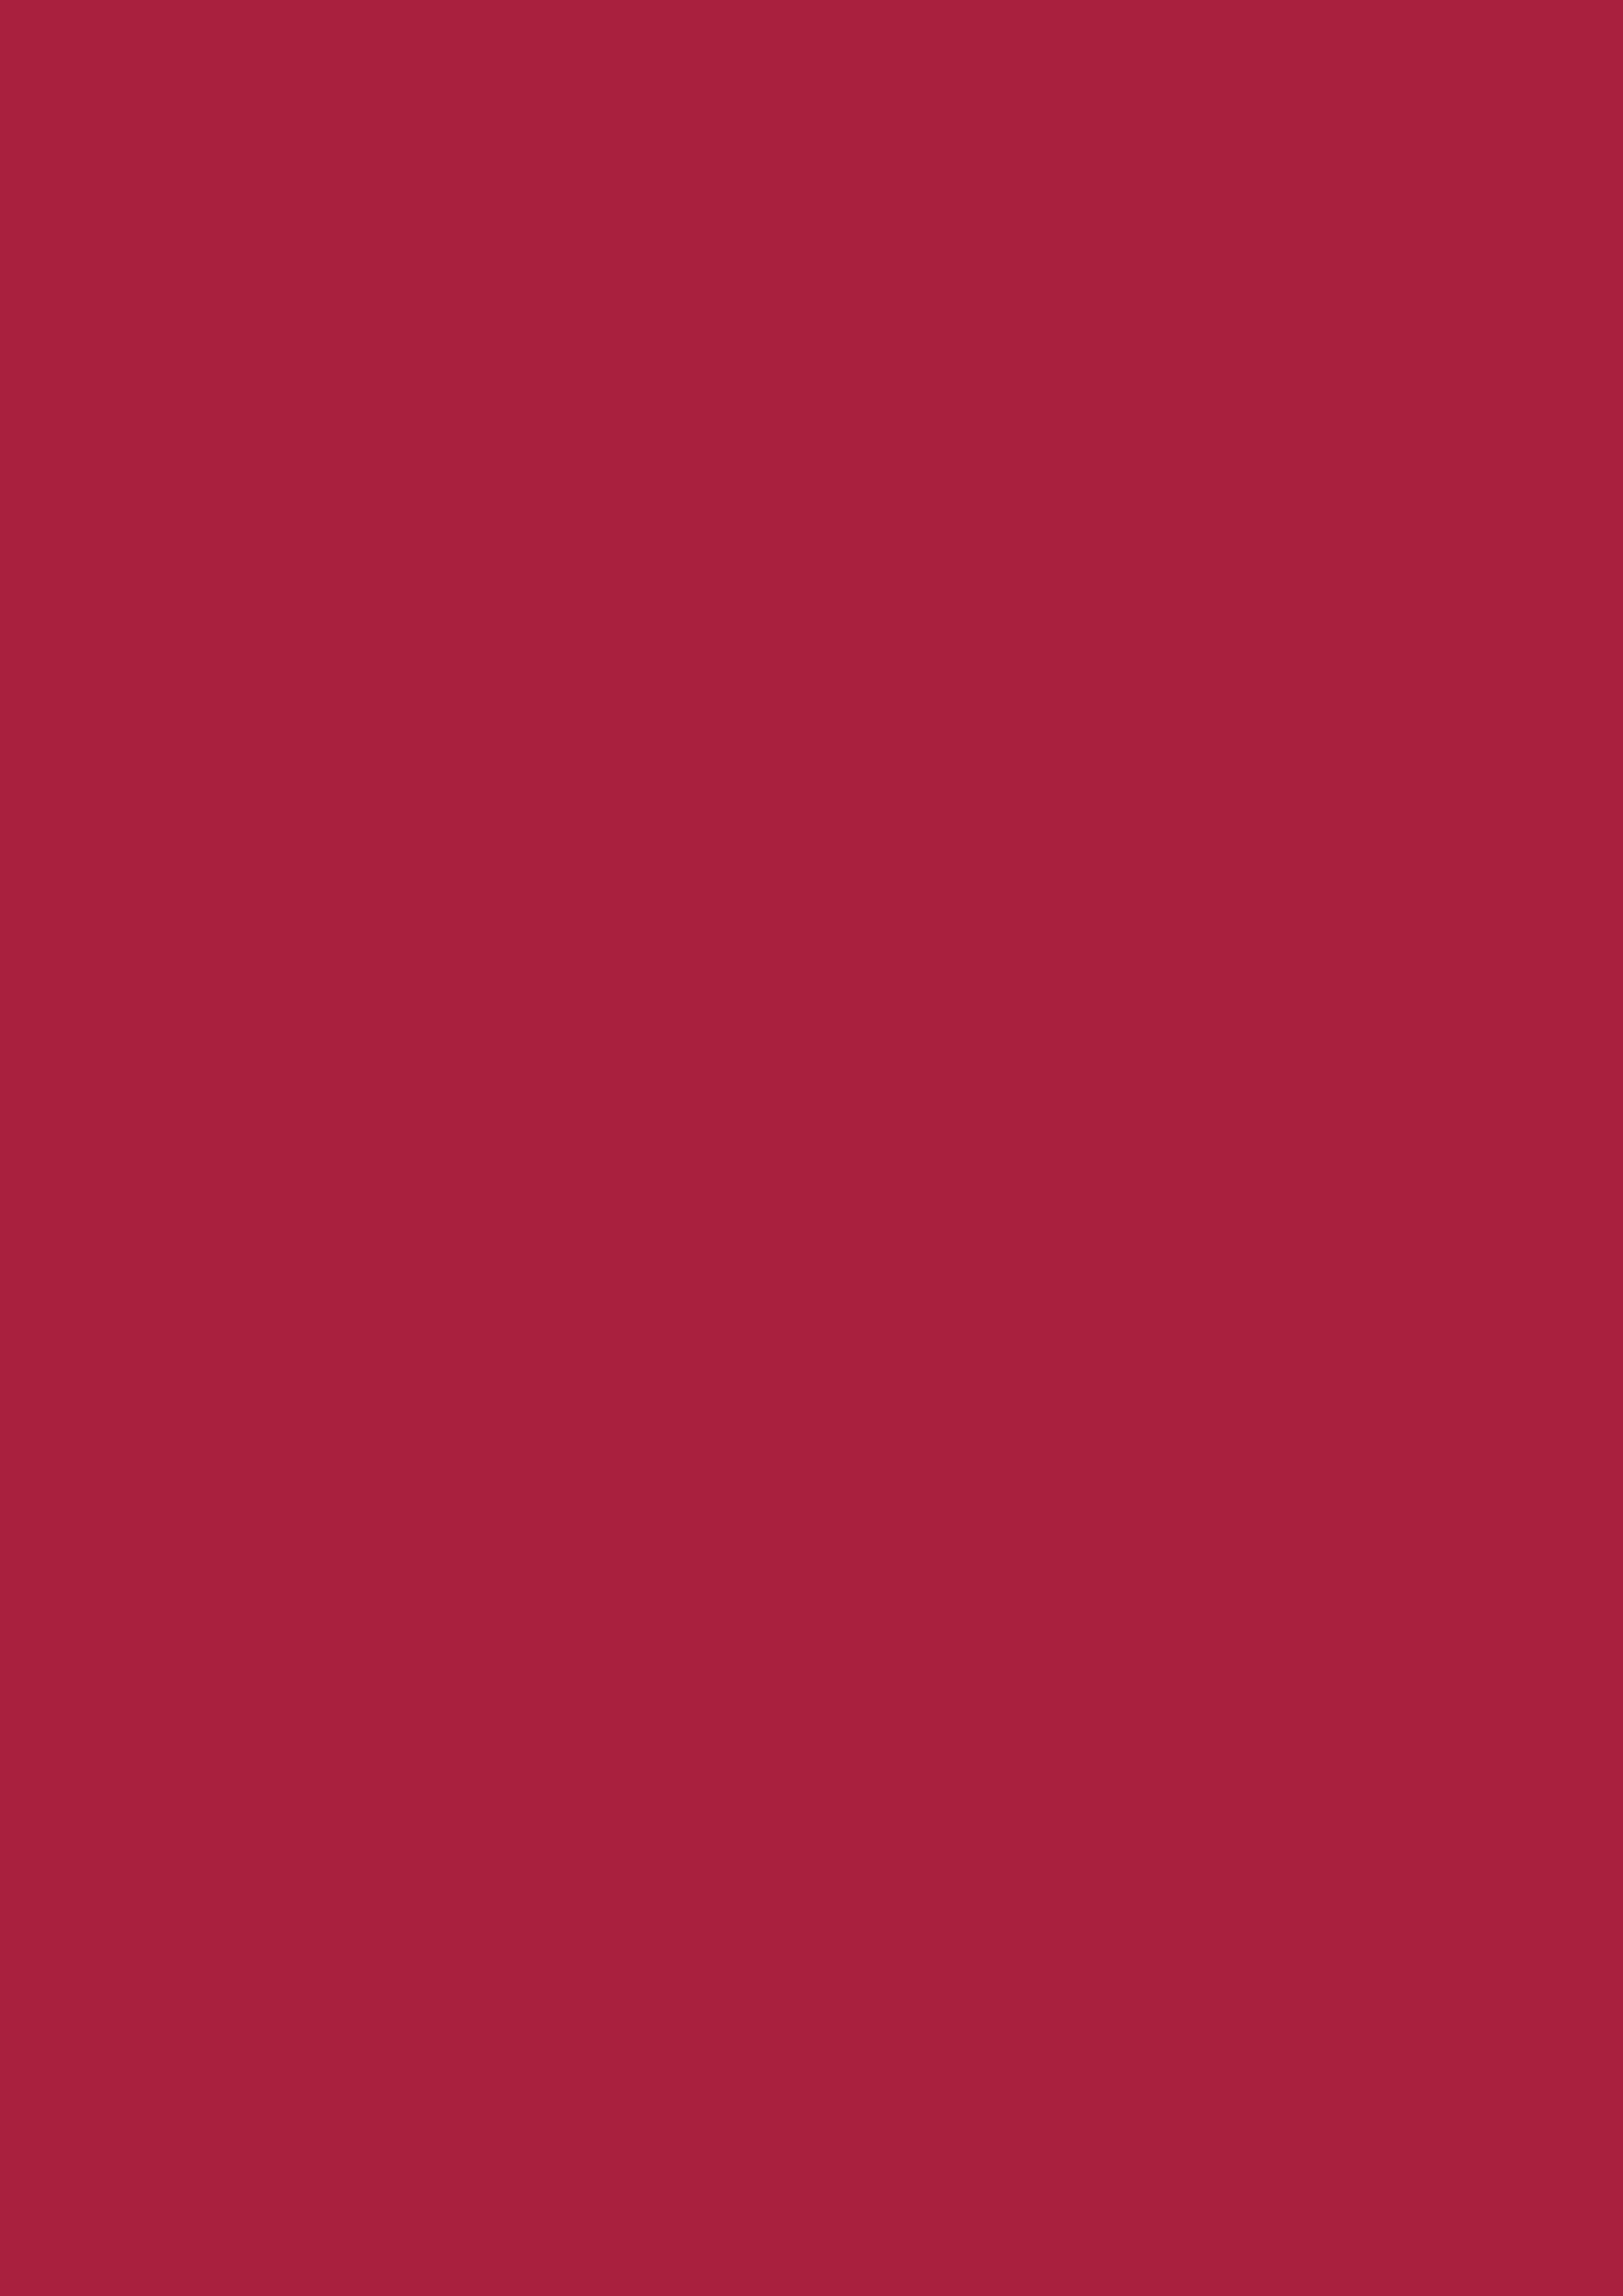 2480x3508 Deep Carmine Solid Color Background